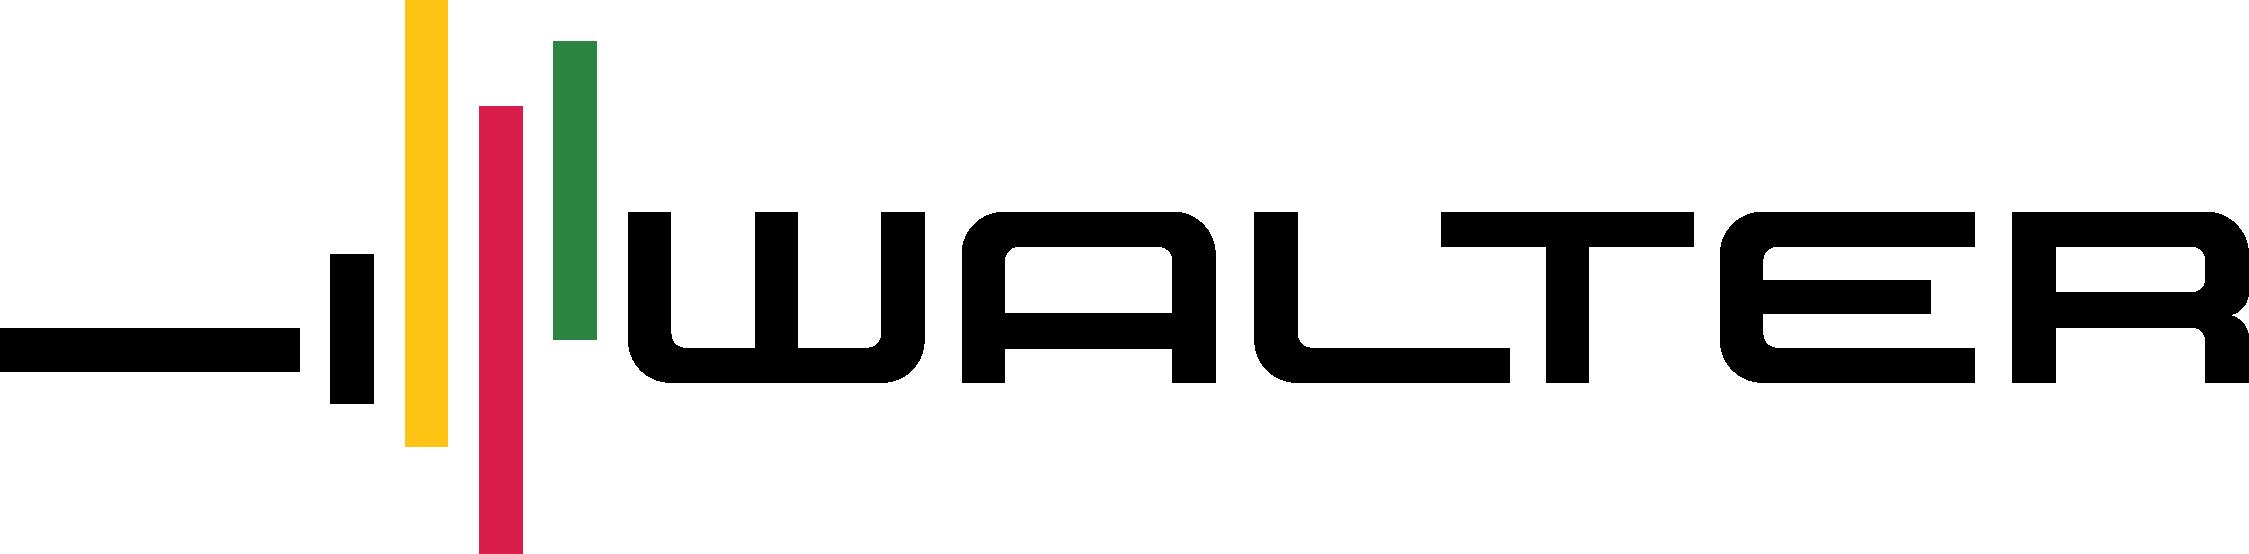 Walter Tools Logo